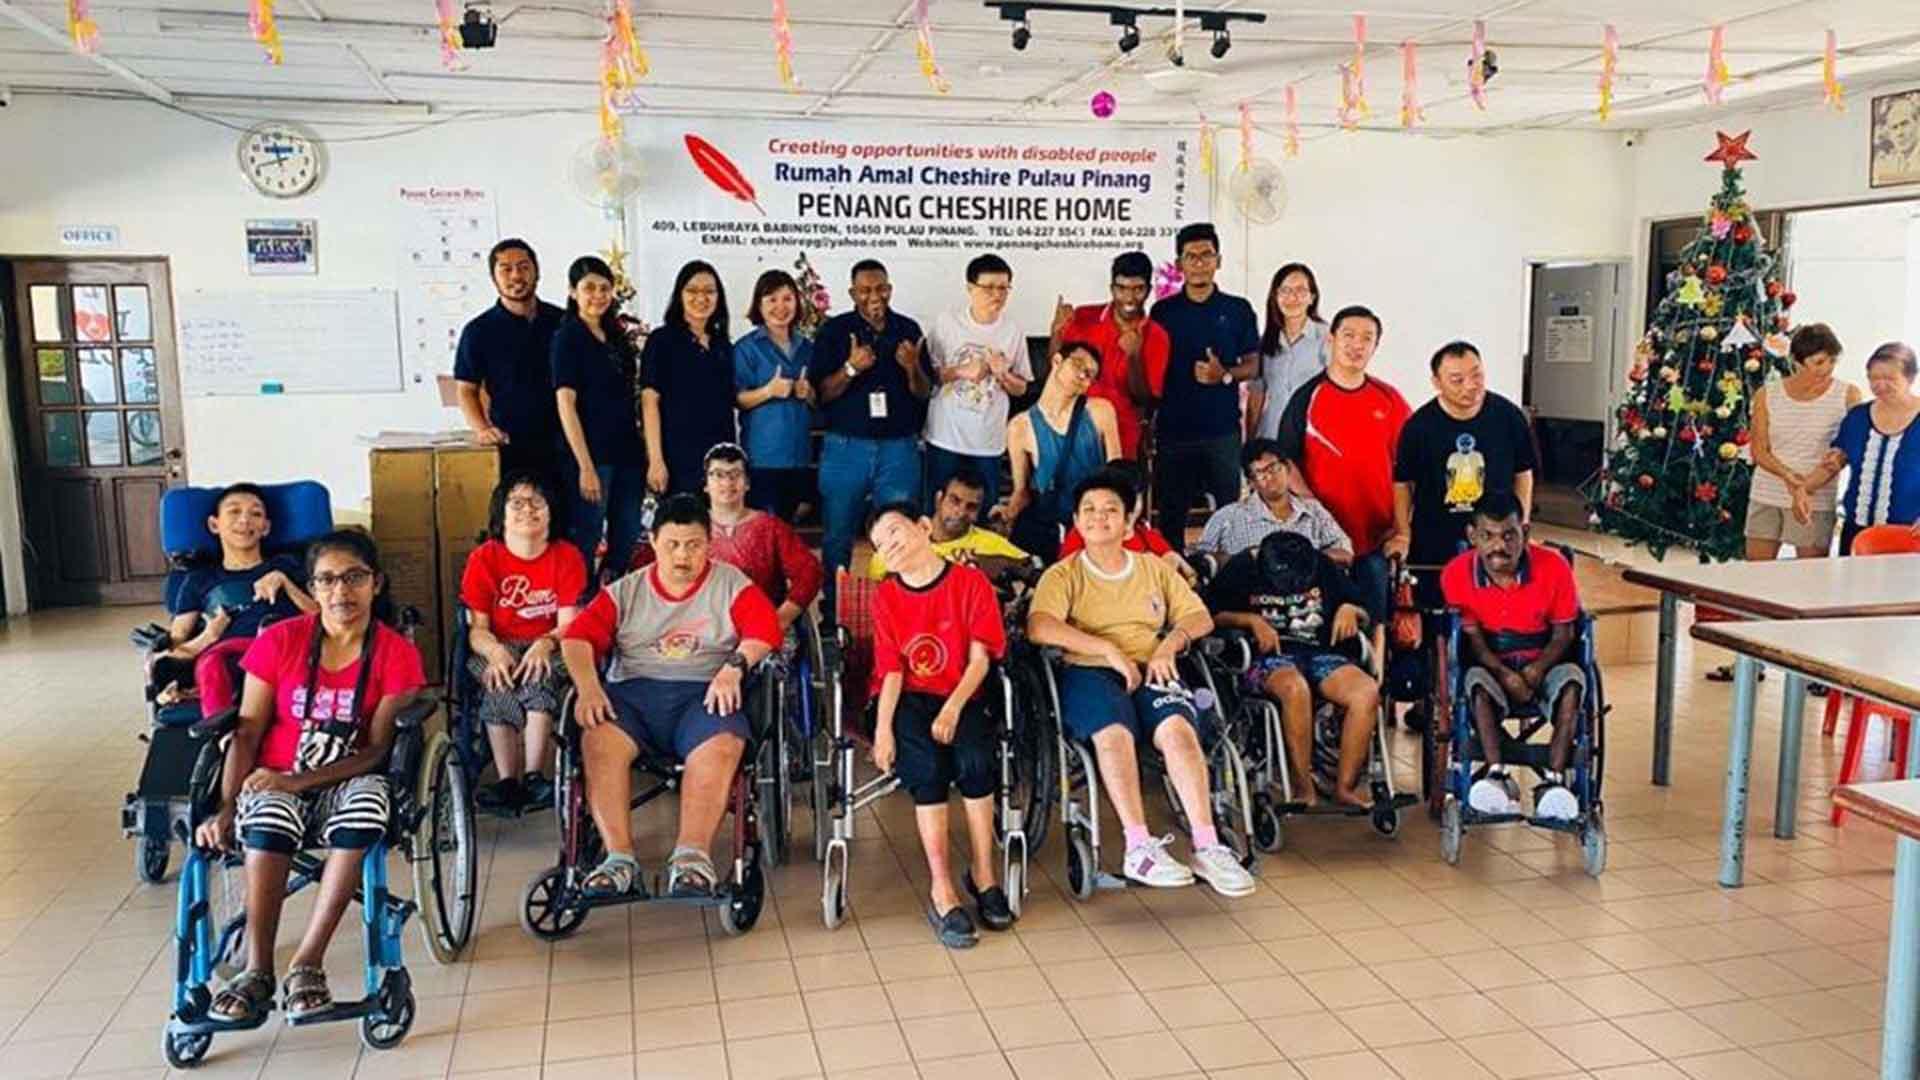 Dufu donates to Penang Cheshire Home